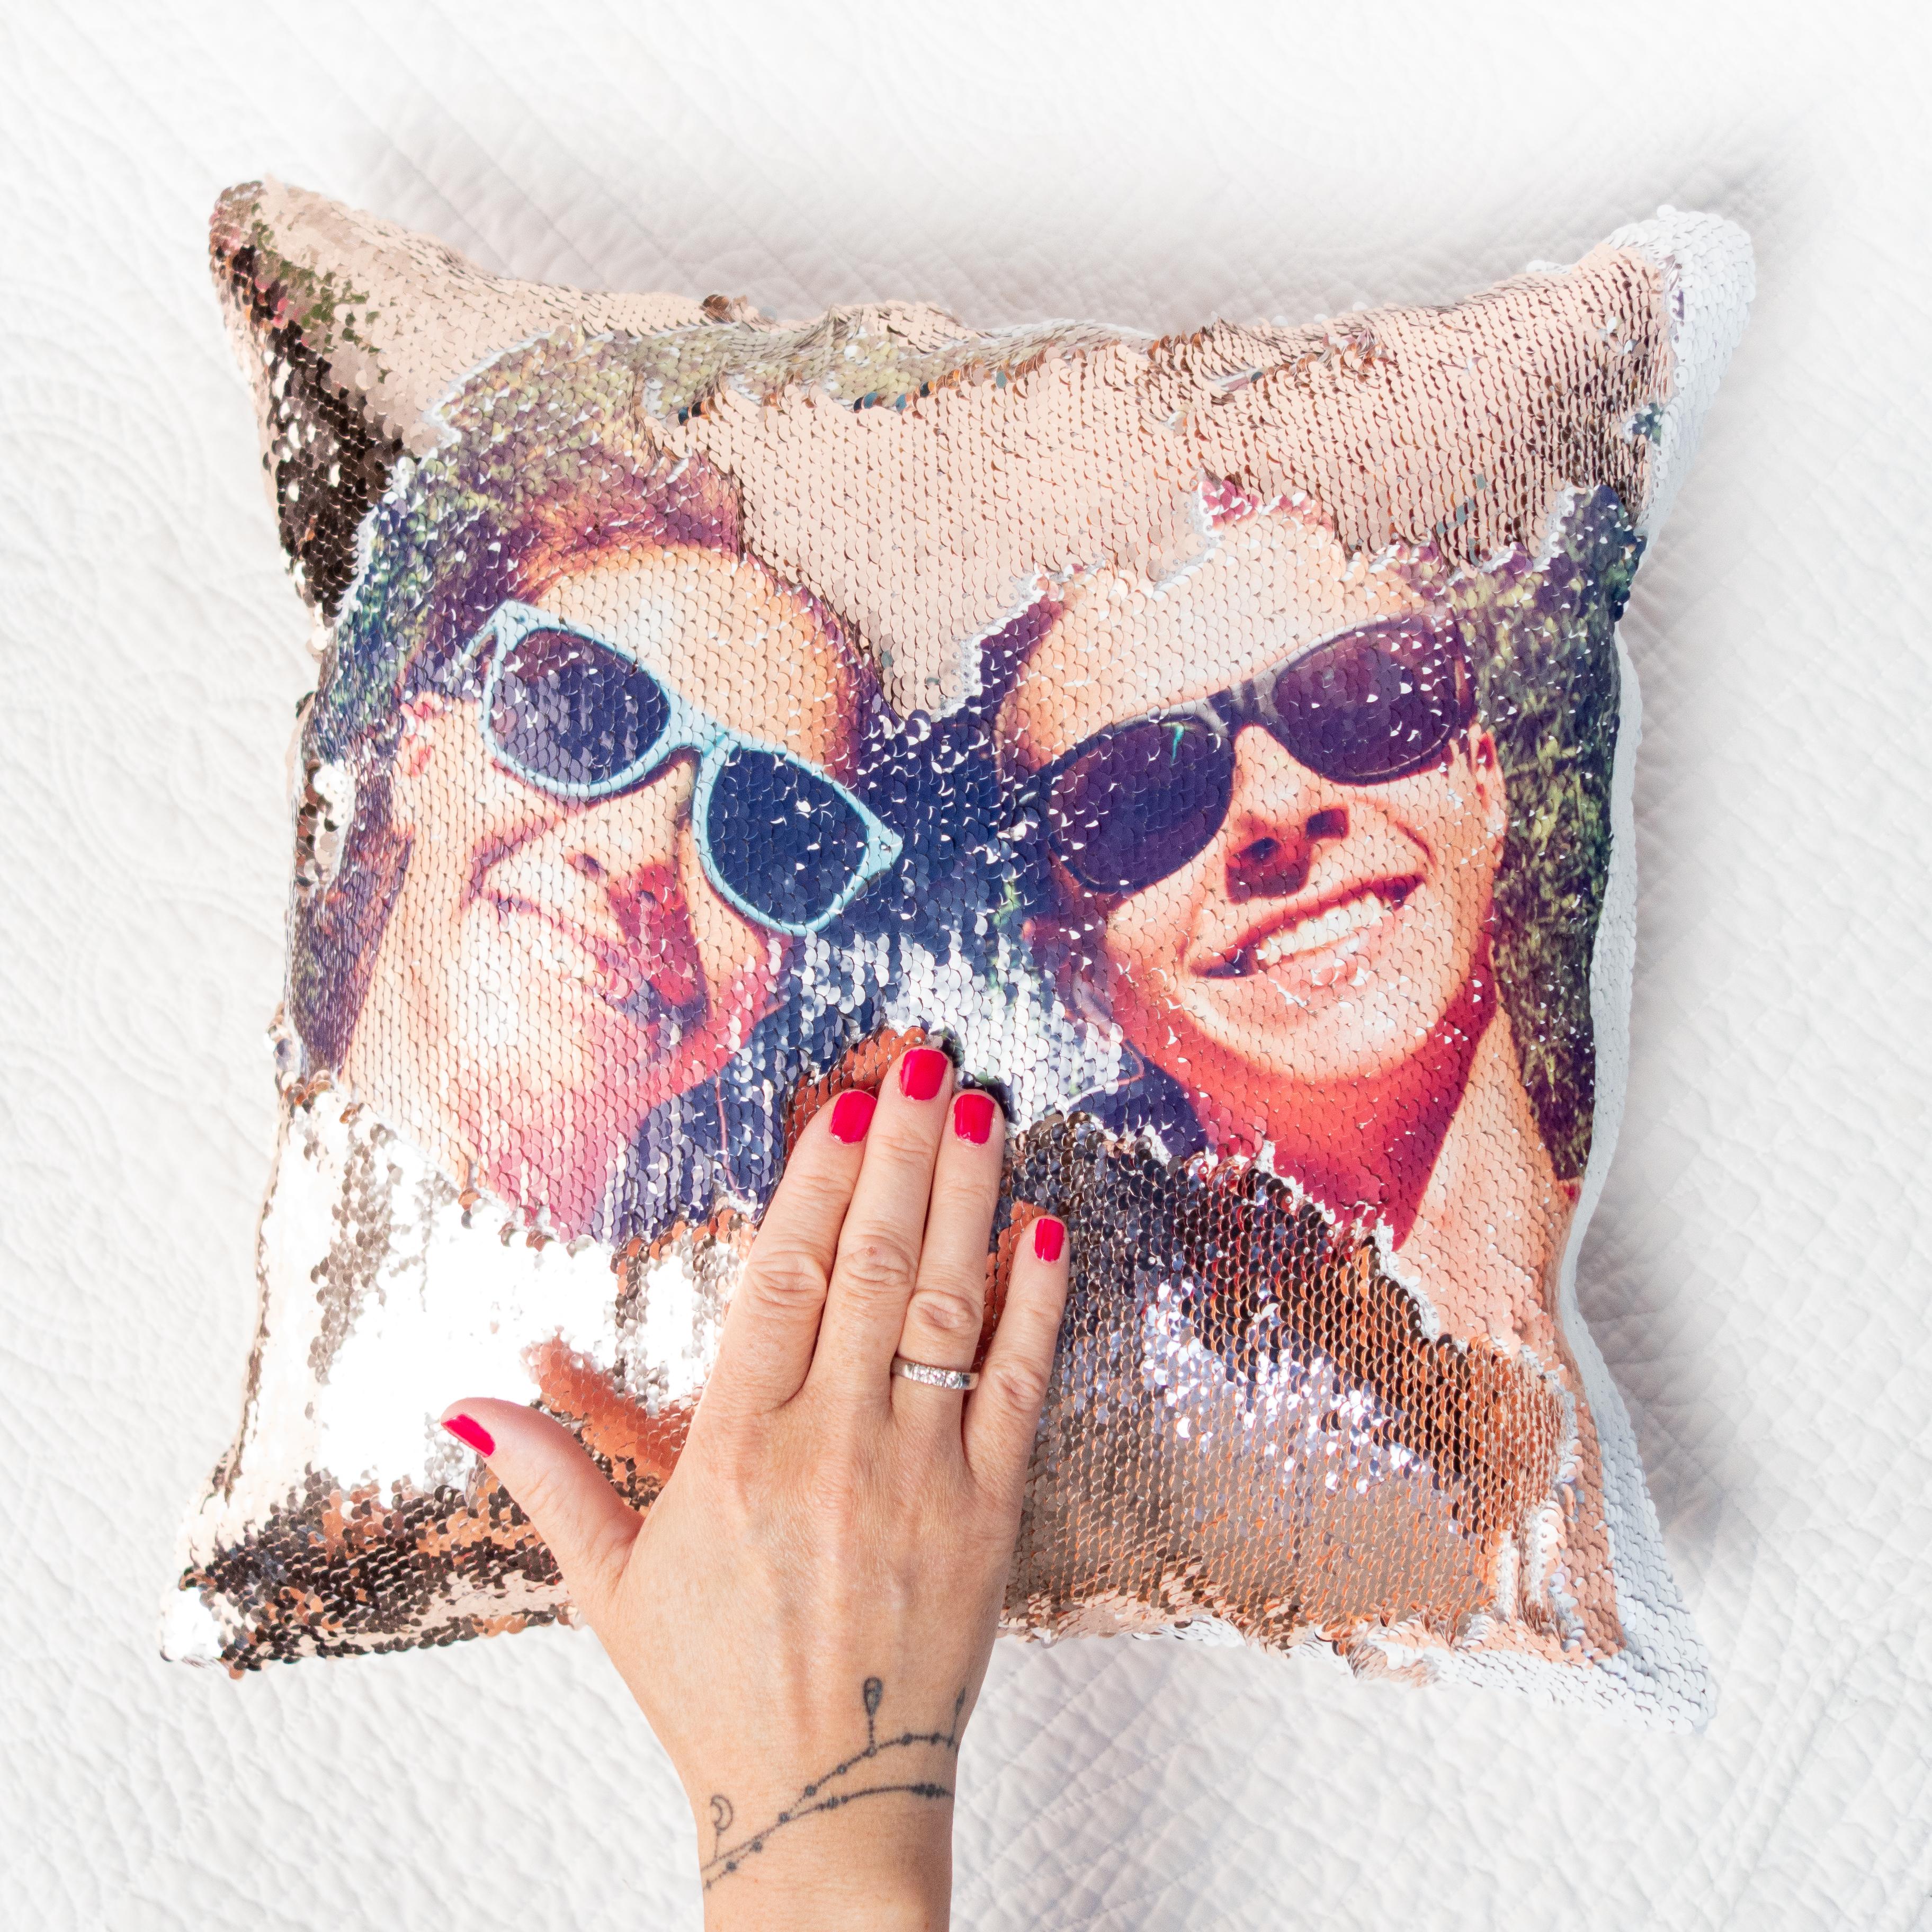 cadeau_voor_haar_personaliseerbaar_glitter_kussensloop_met_foto